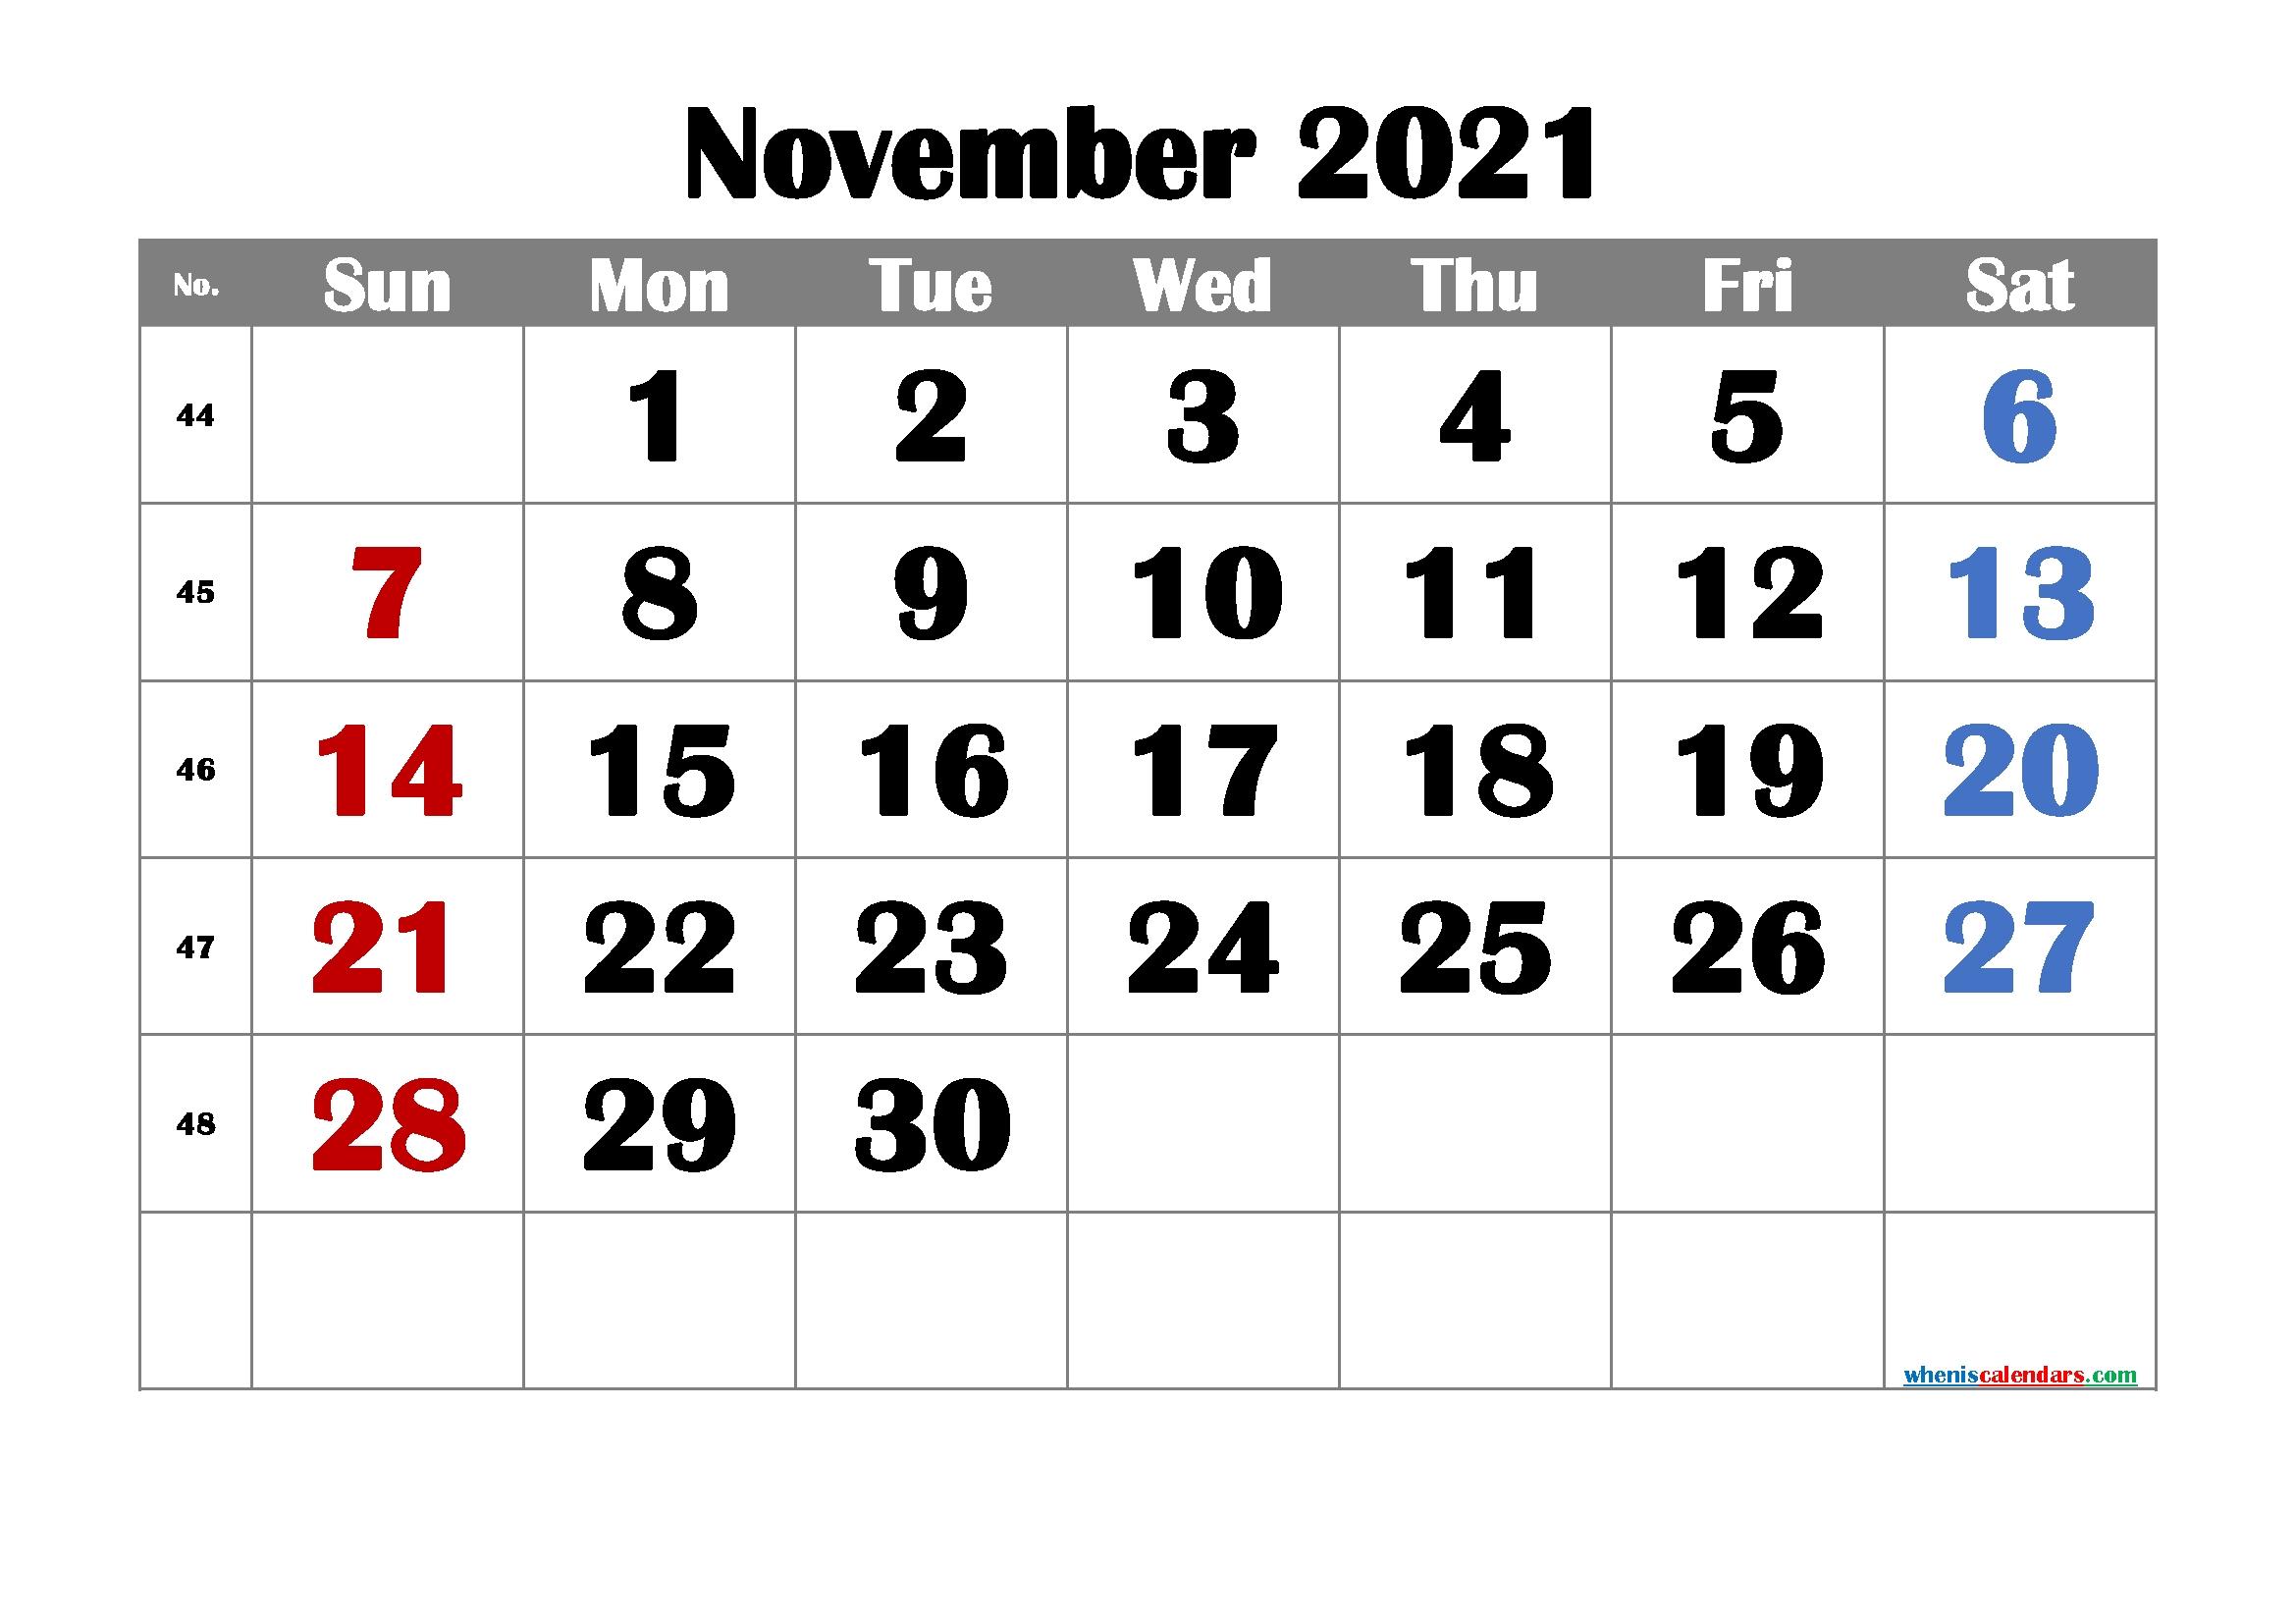 Free Printable November 2021 Calendar Printable Calendar For November 2021